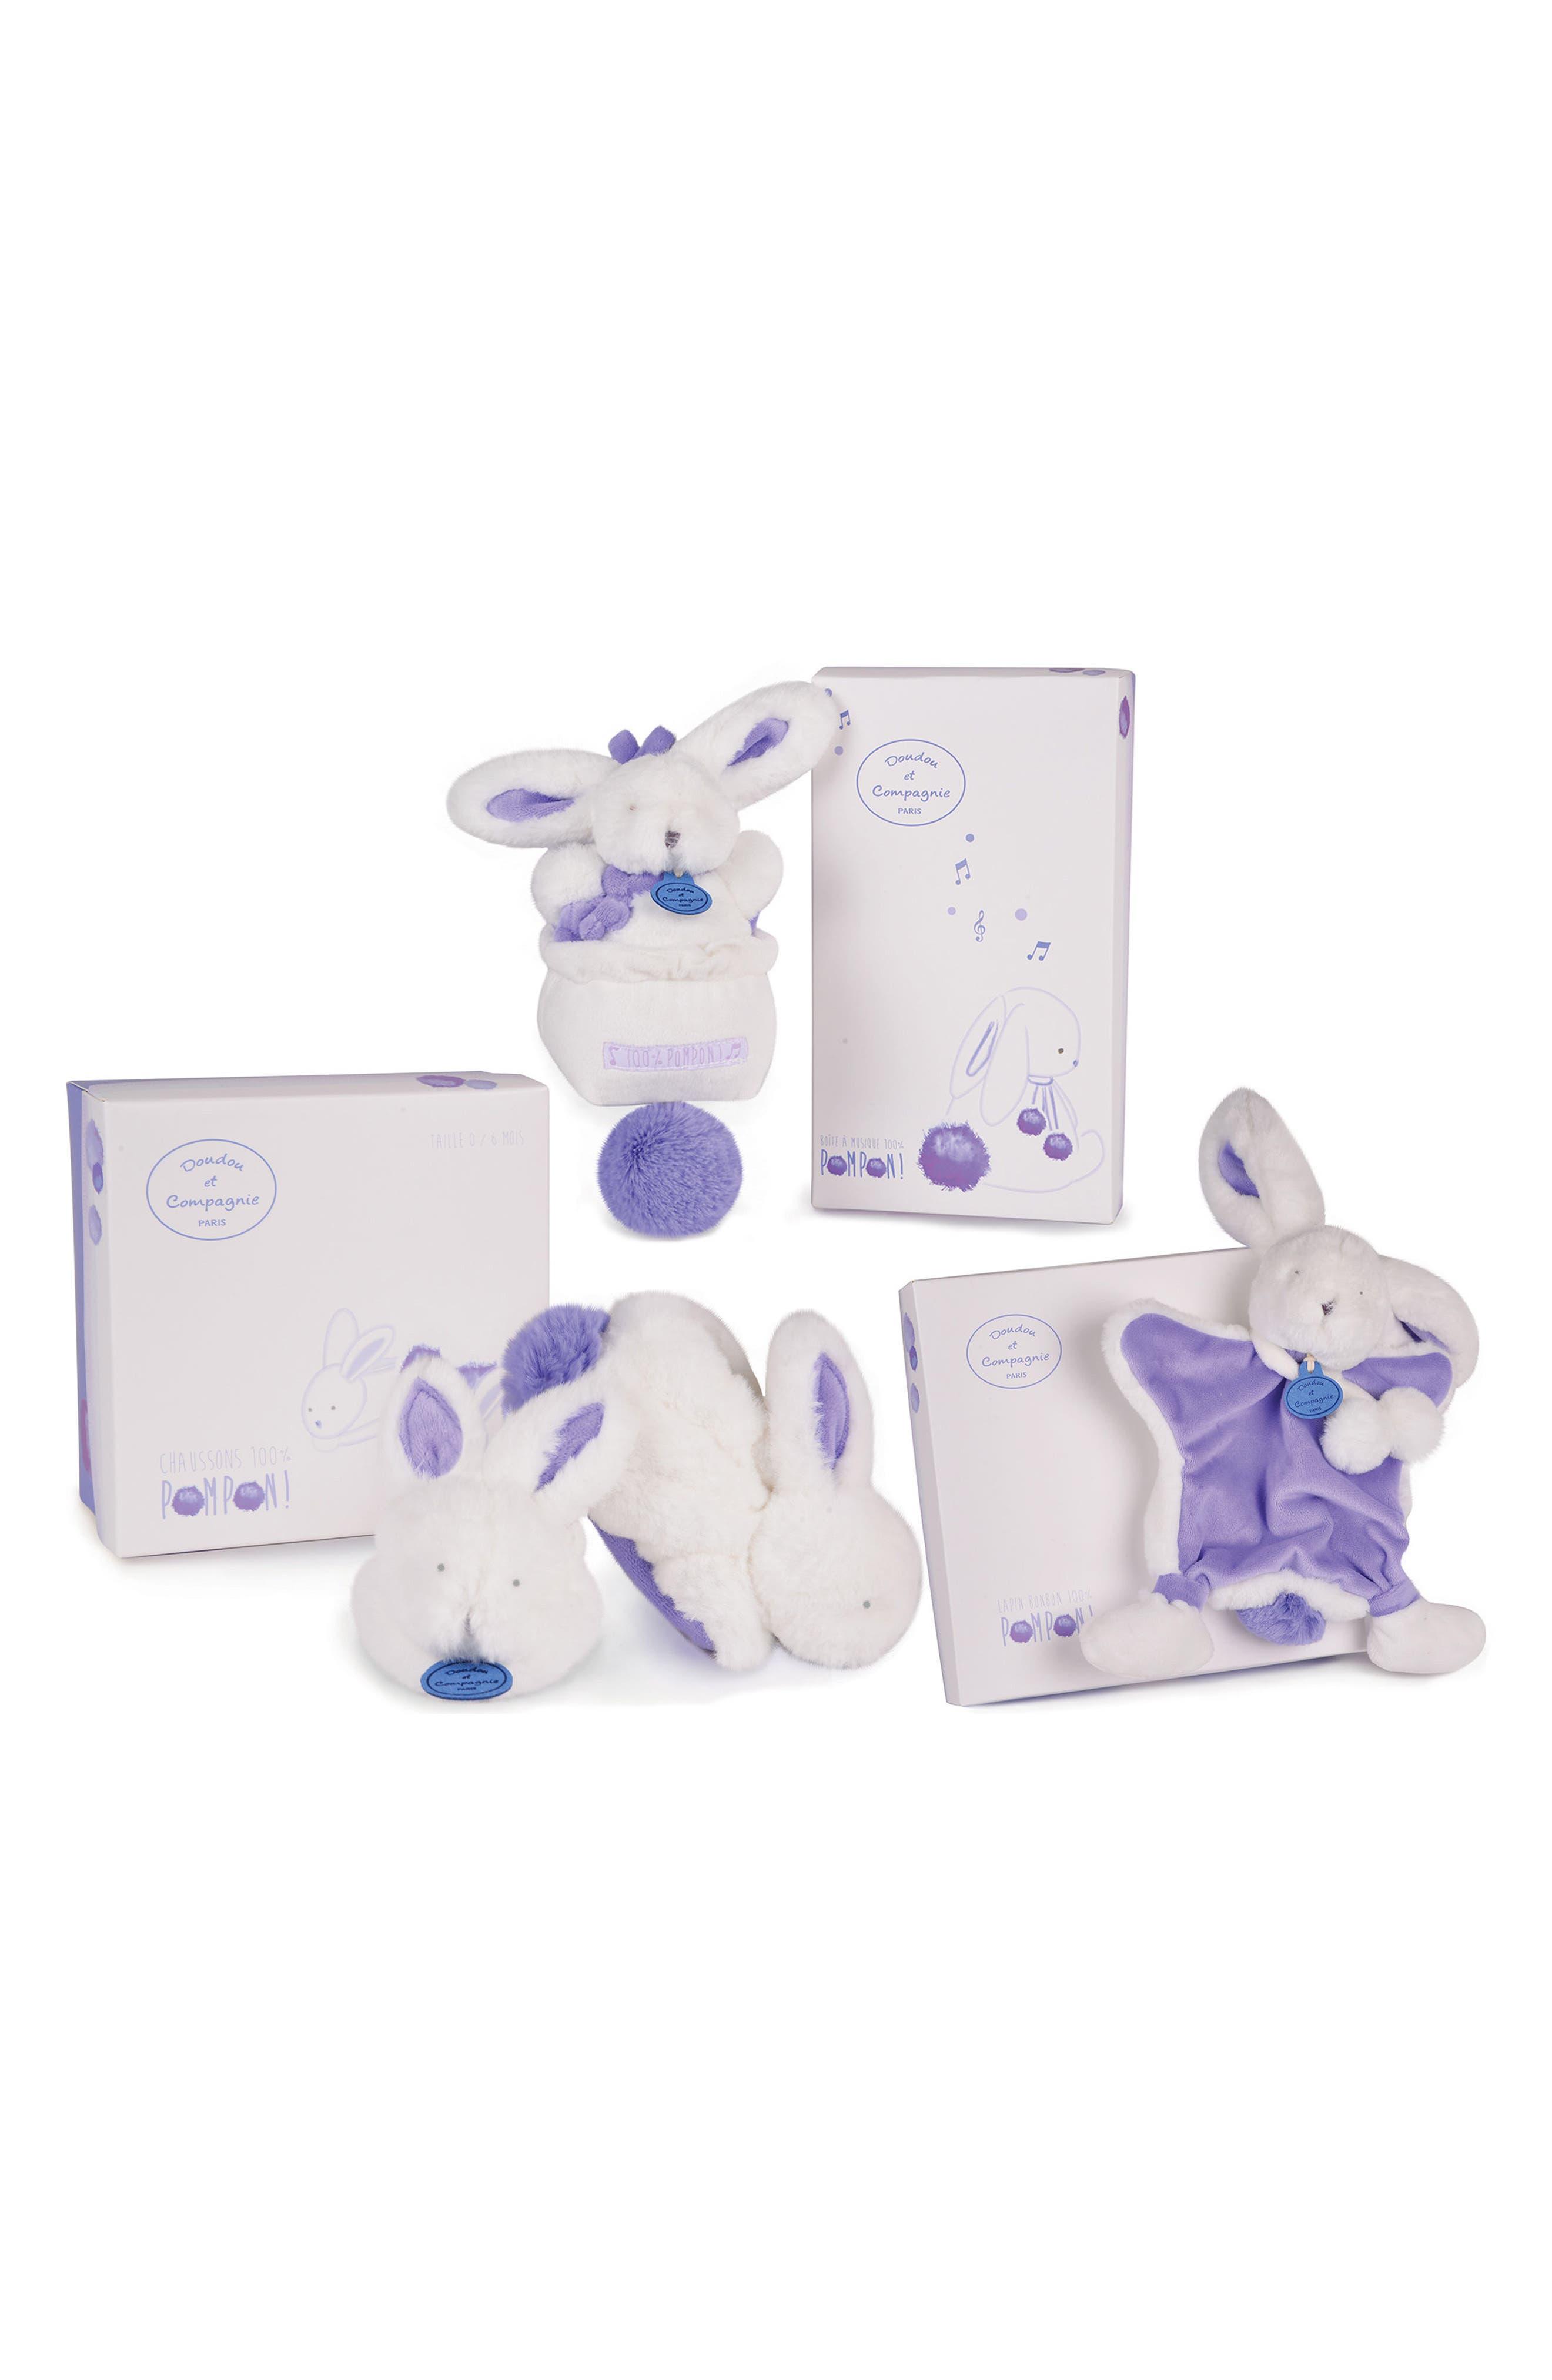 Doudou et Compagnie Lavender Booties, Lovie Blanket & Pull Musical Toy Gift Set